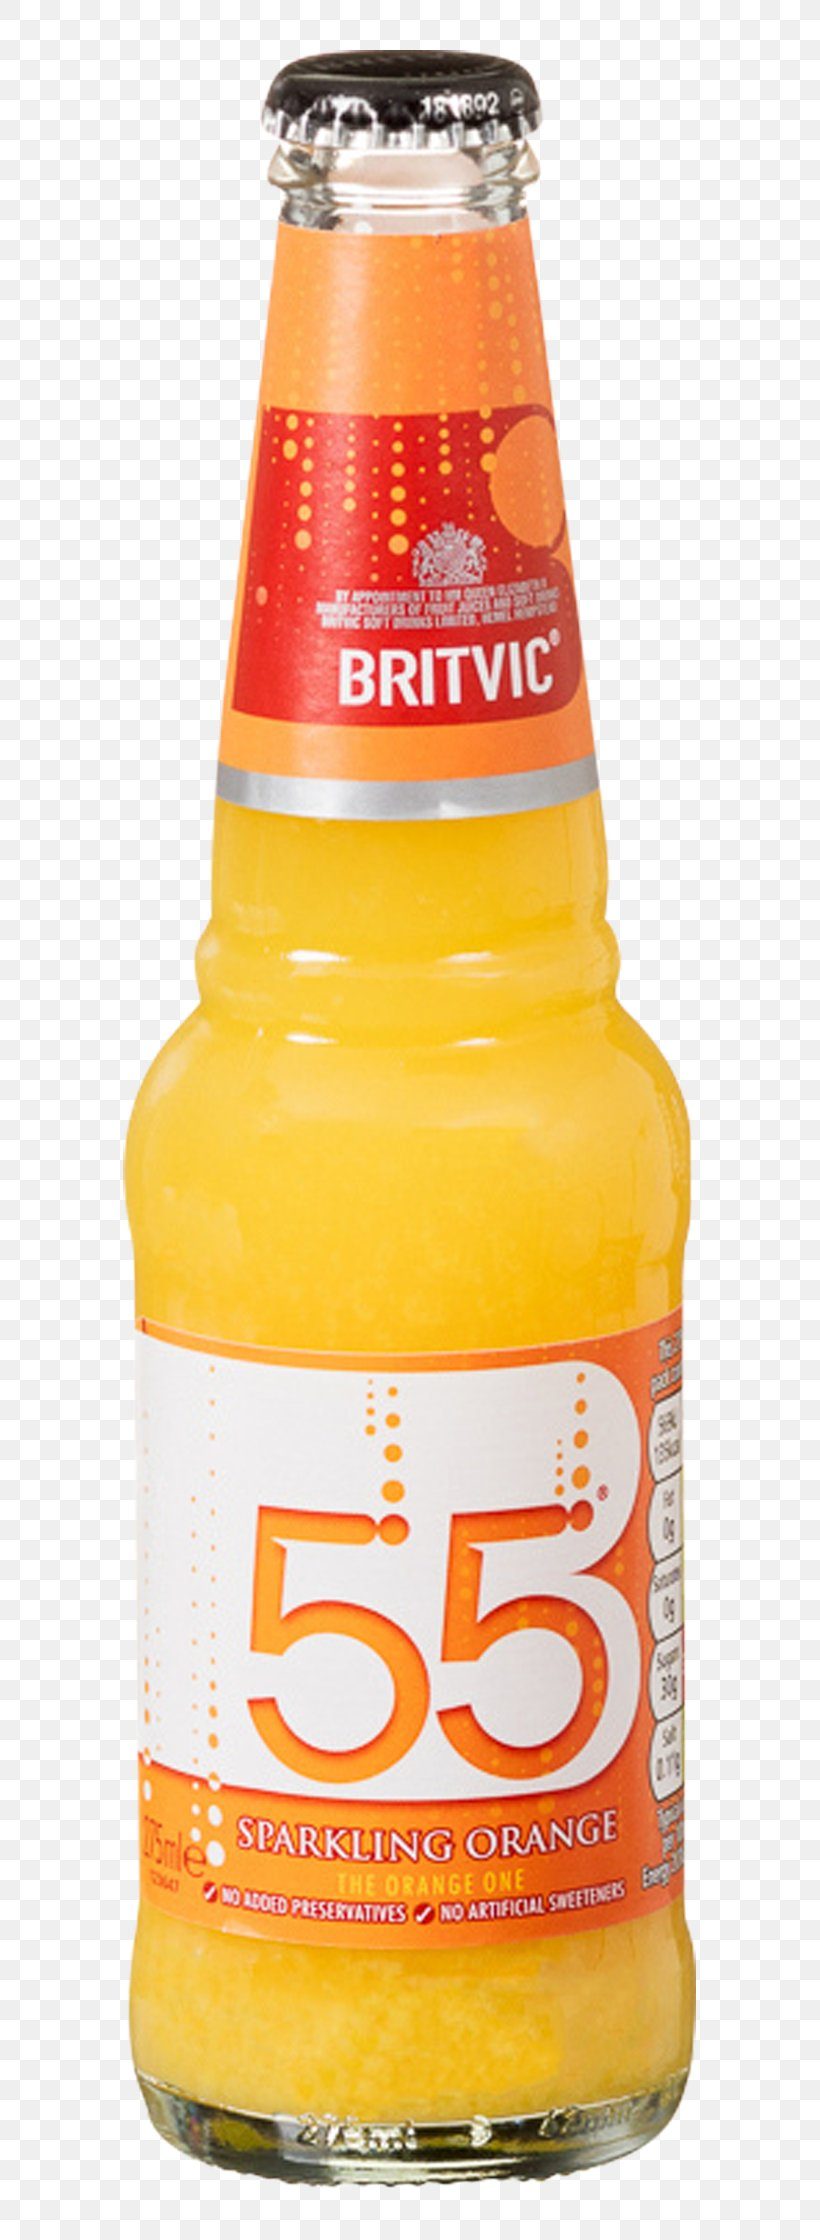 Orange Drink Juice Fizzy Drinks Orange Soft Drink Fuzzy Navel, PNG, 752x2240px, Orange Drink, Beer Bottle, Bottle, Britvic, Drink Download Free